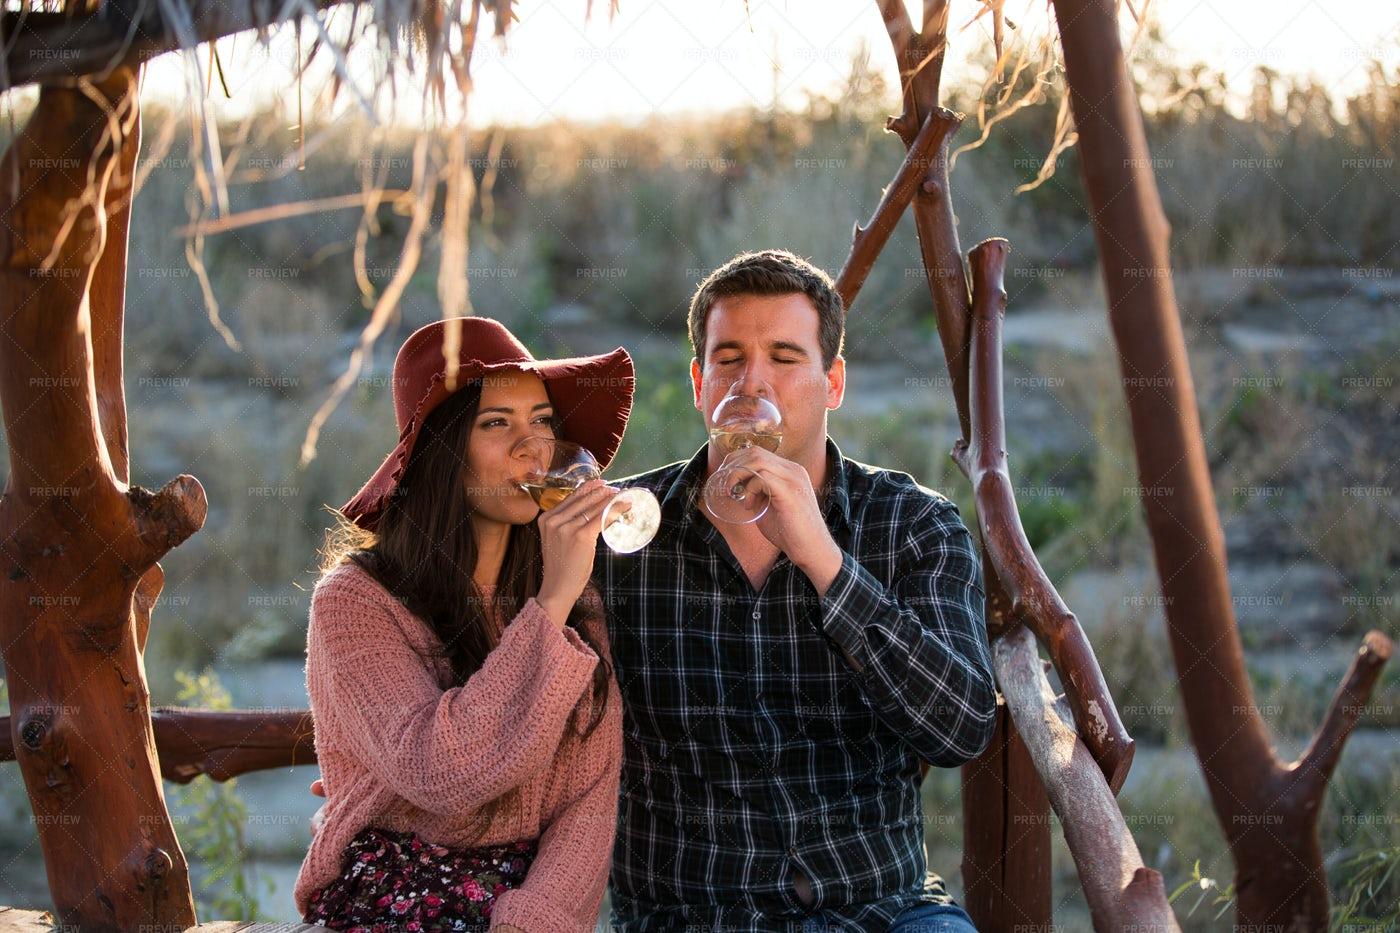 Couple Drinking Wine In Vineyard: Stock Photos